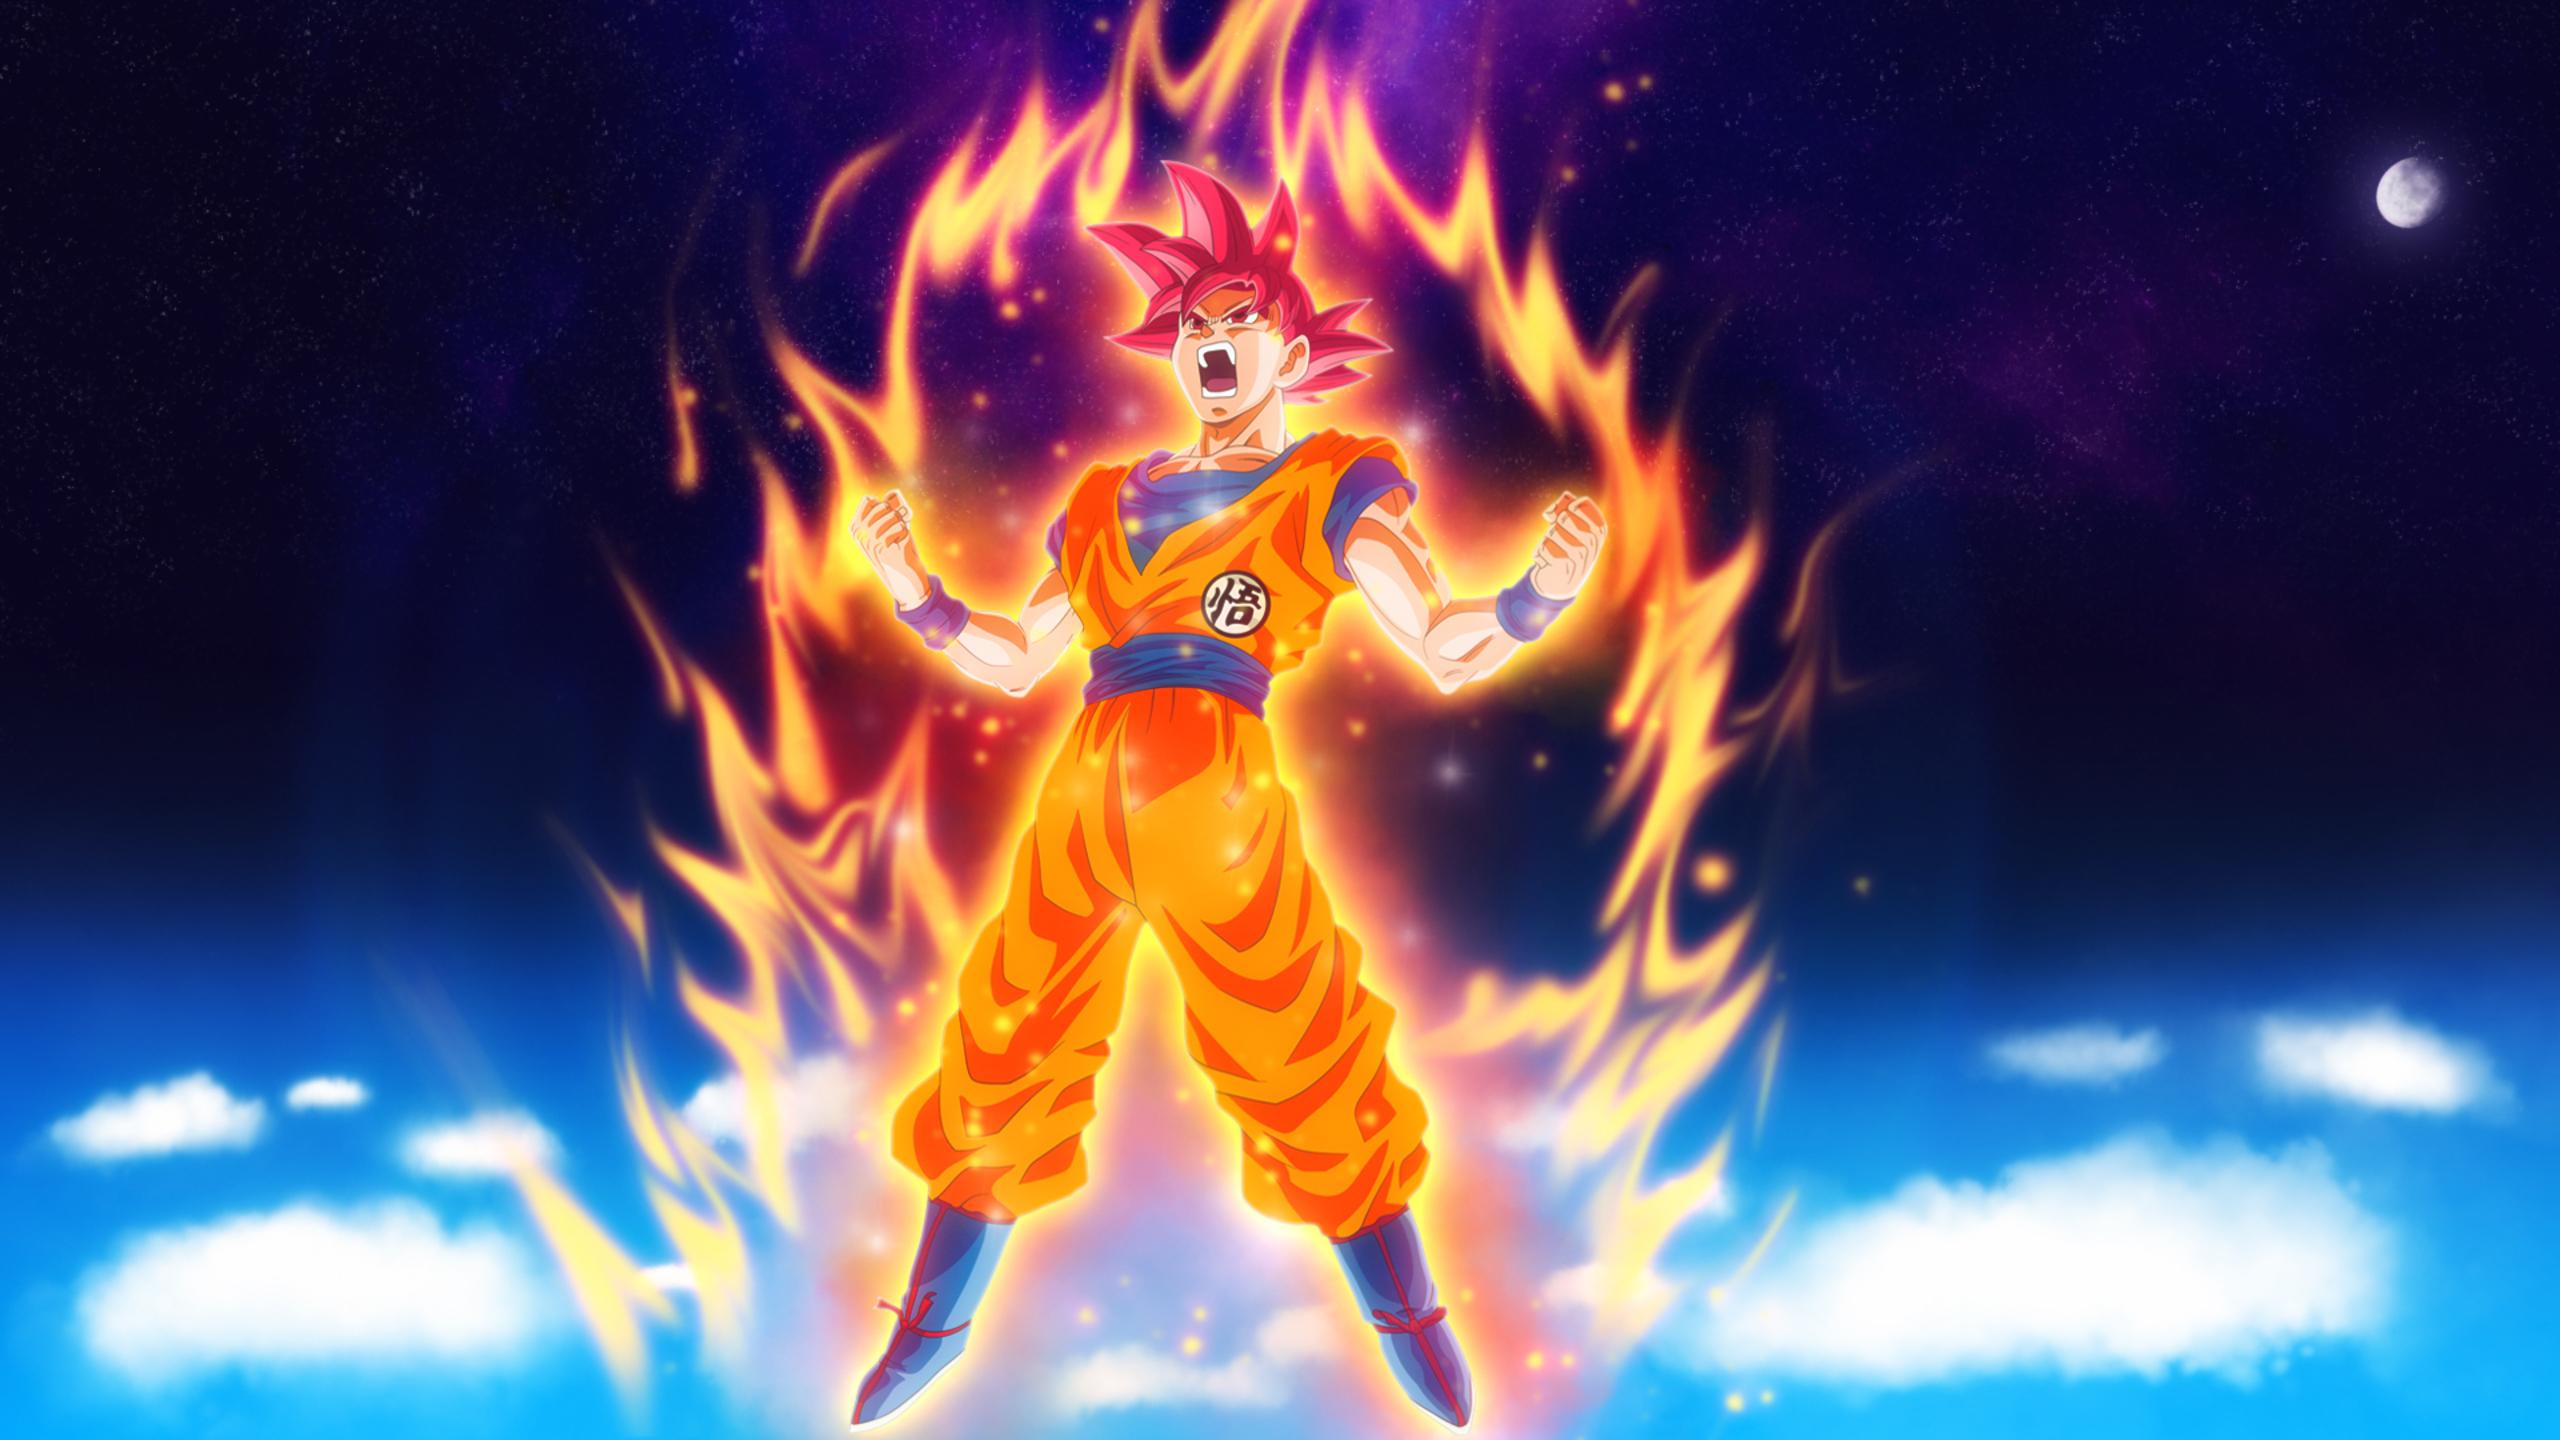 2560x1440 Dragon Ball Z Goku 1440p Resolution Hd 4k